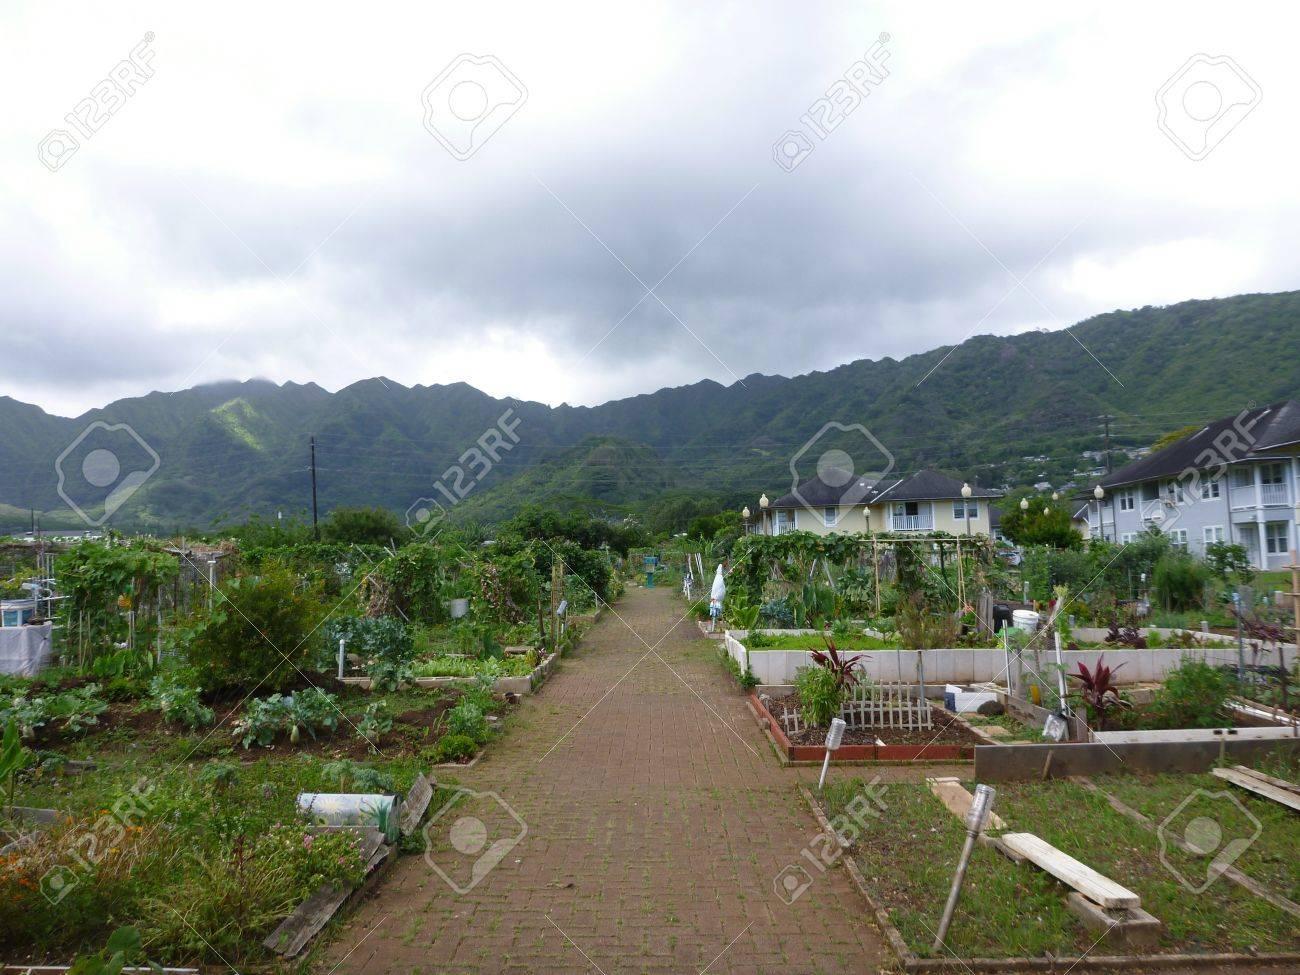 Manoa Community Garden in Manoa Valley on Oahu, Hawaii  On an overcast day Stock Photo - 18147558